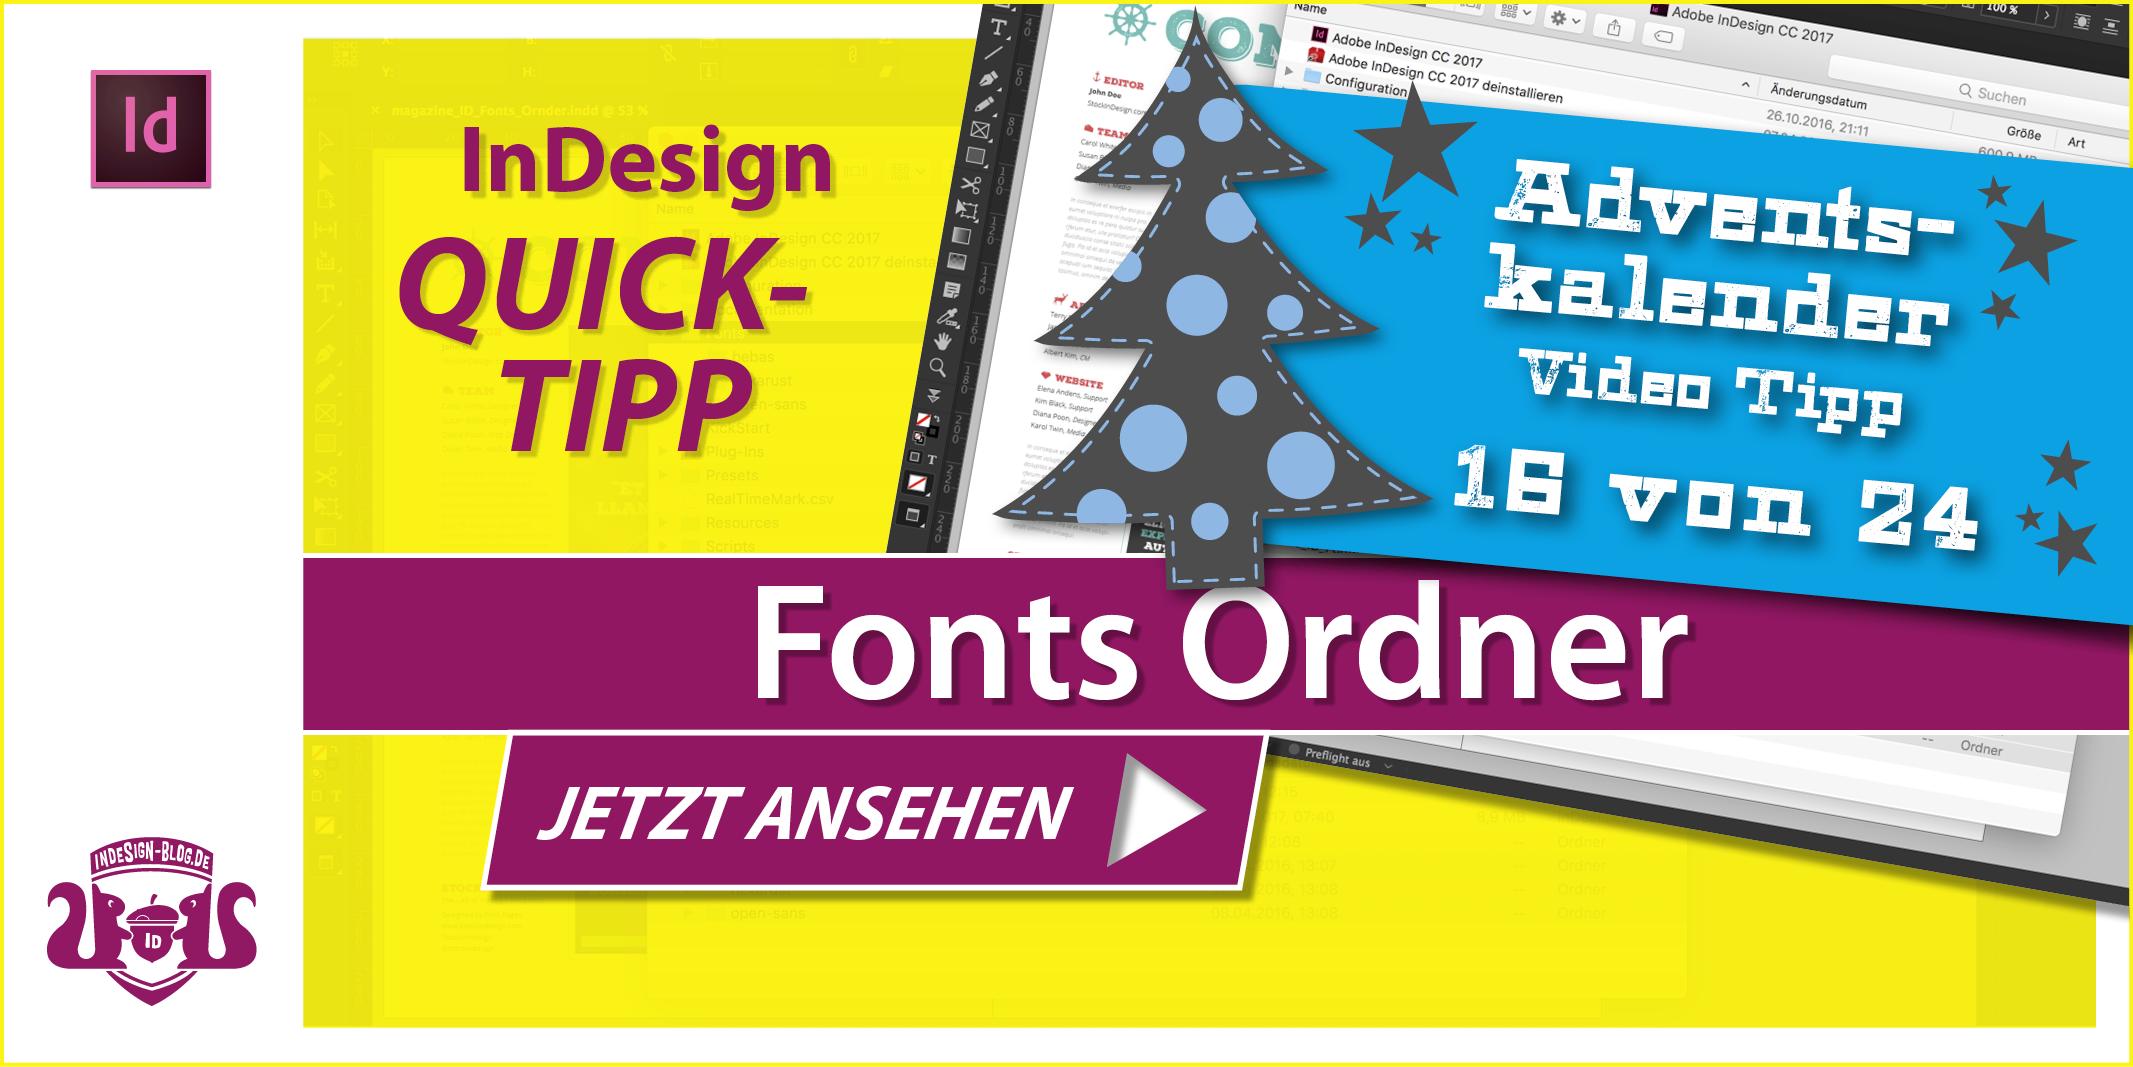 Thumbnail Quicktipp InDesign eigener Fonts Ordner